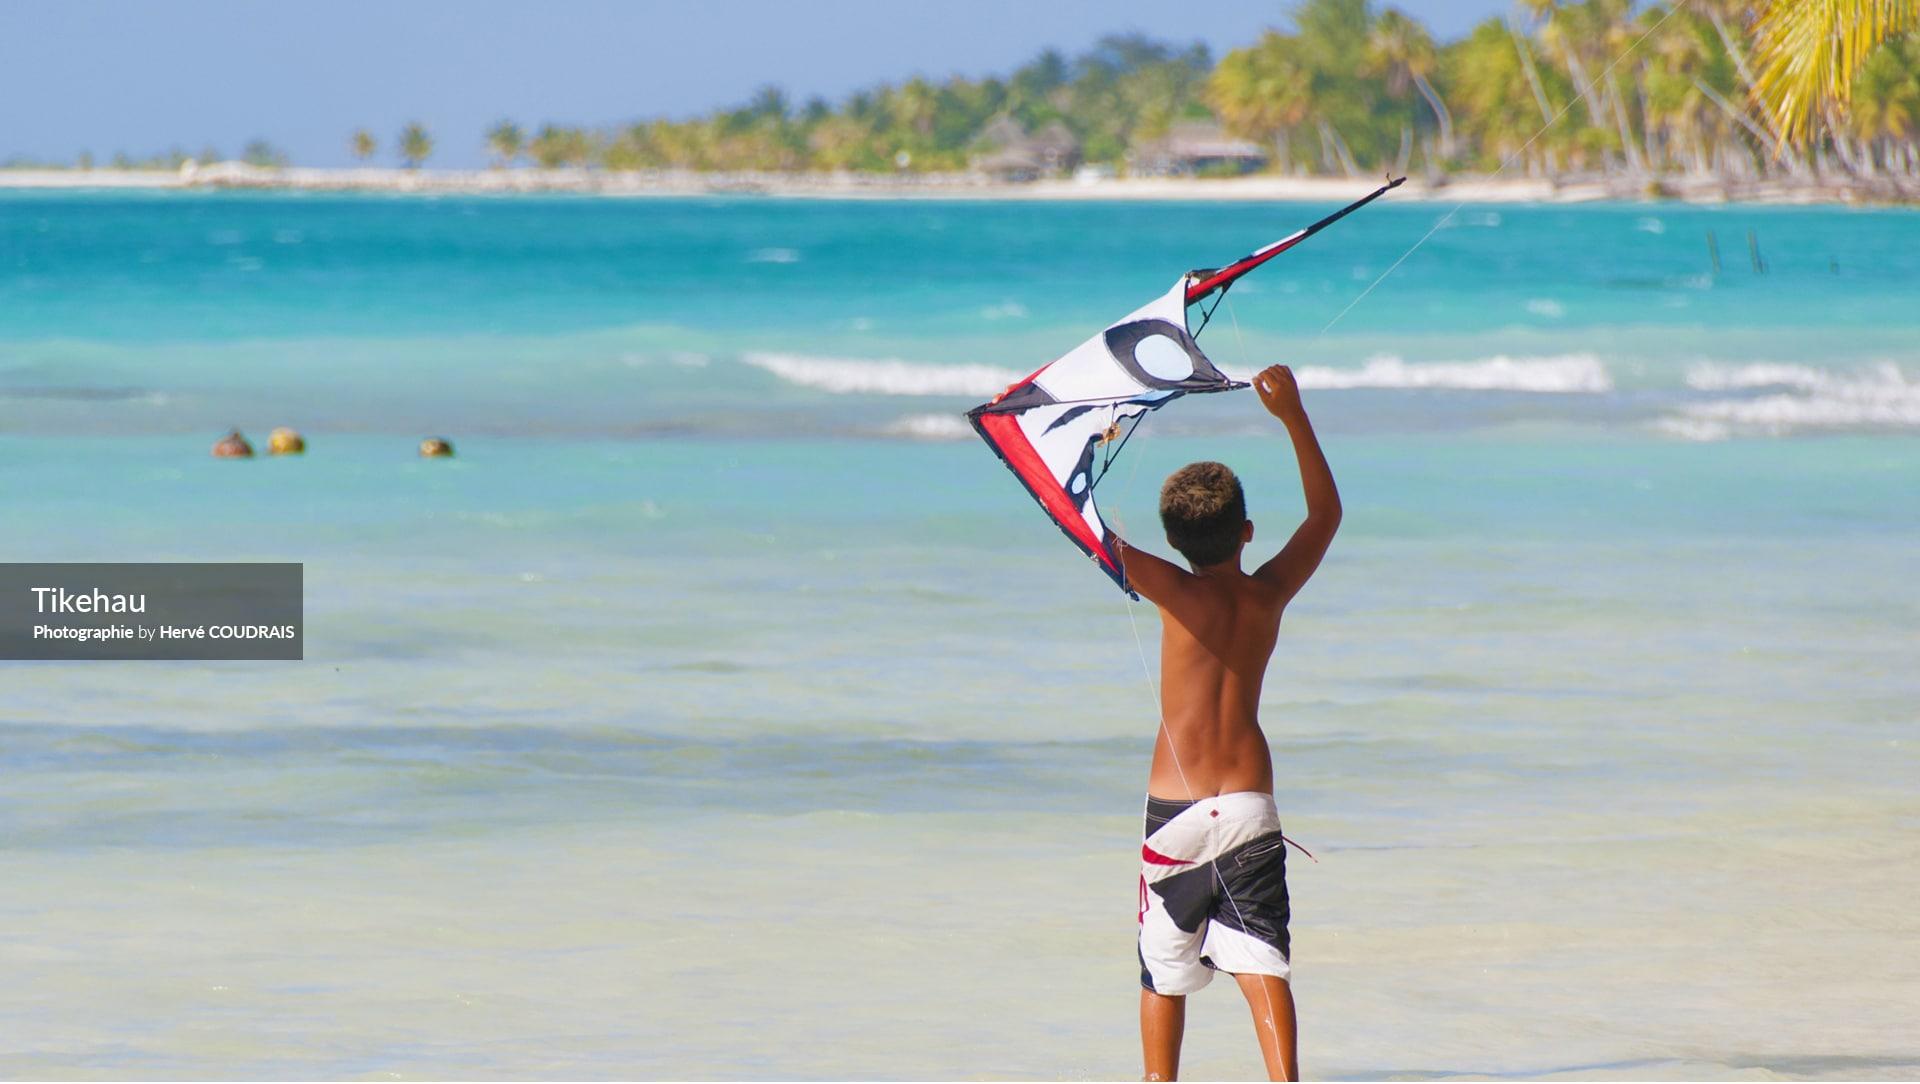 Tikehau, Atoll des Tuamotu, Polynésie, photographie Hervé Coudrais, cerf-volant, mer turquoise, Polyénsie française,